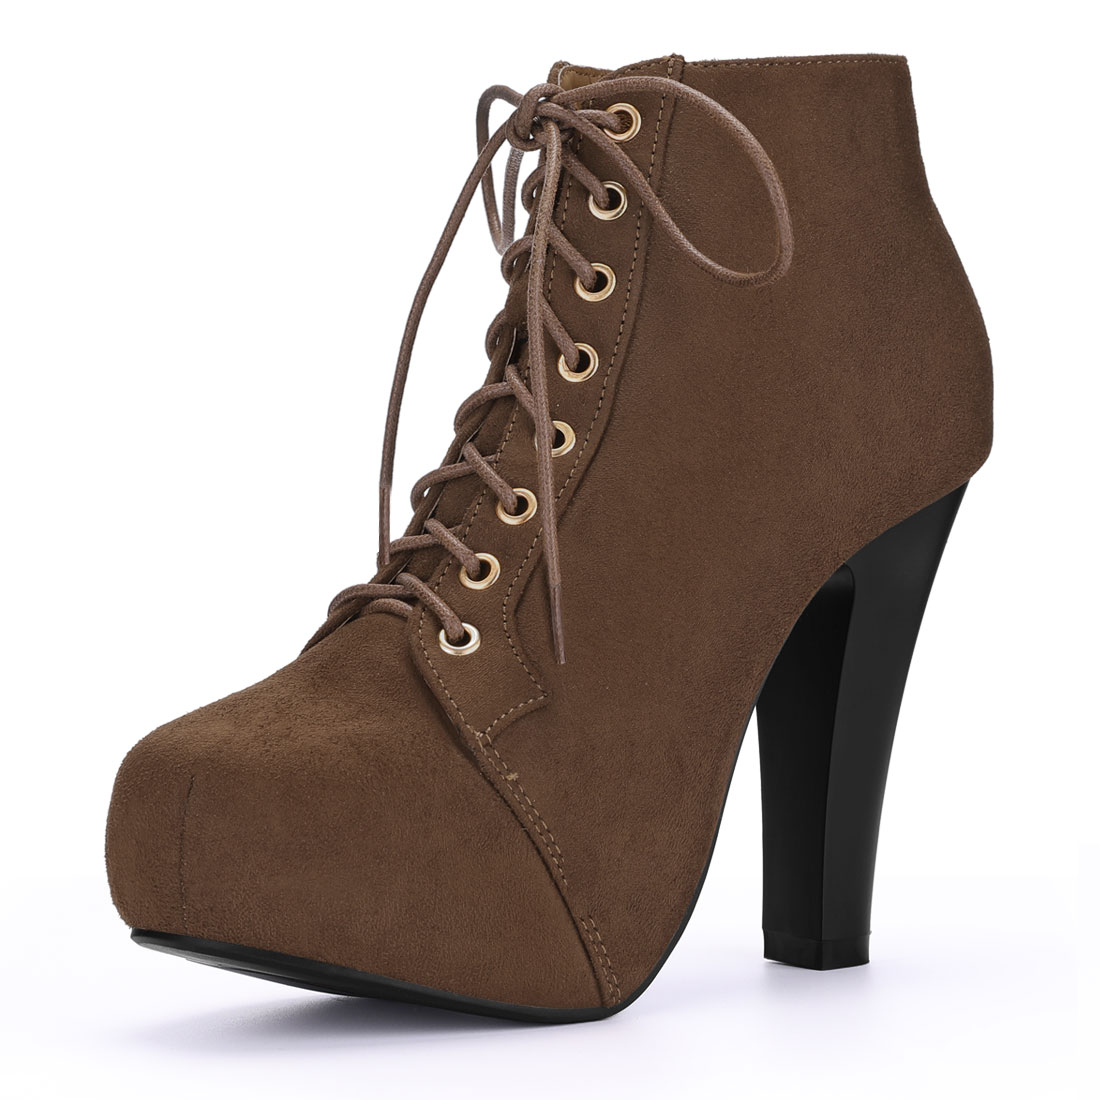 Women Round Toe High Heel Platform Lace Up Booties Coffee US 7